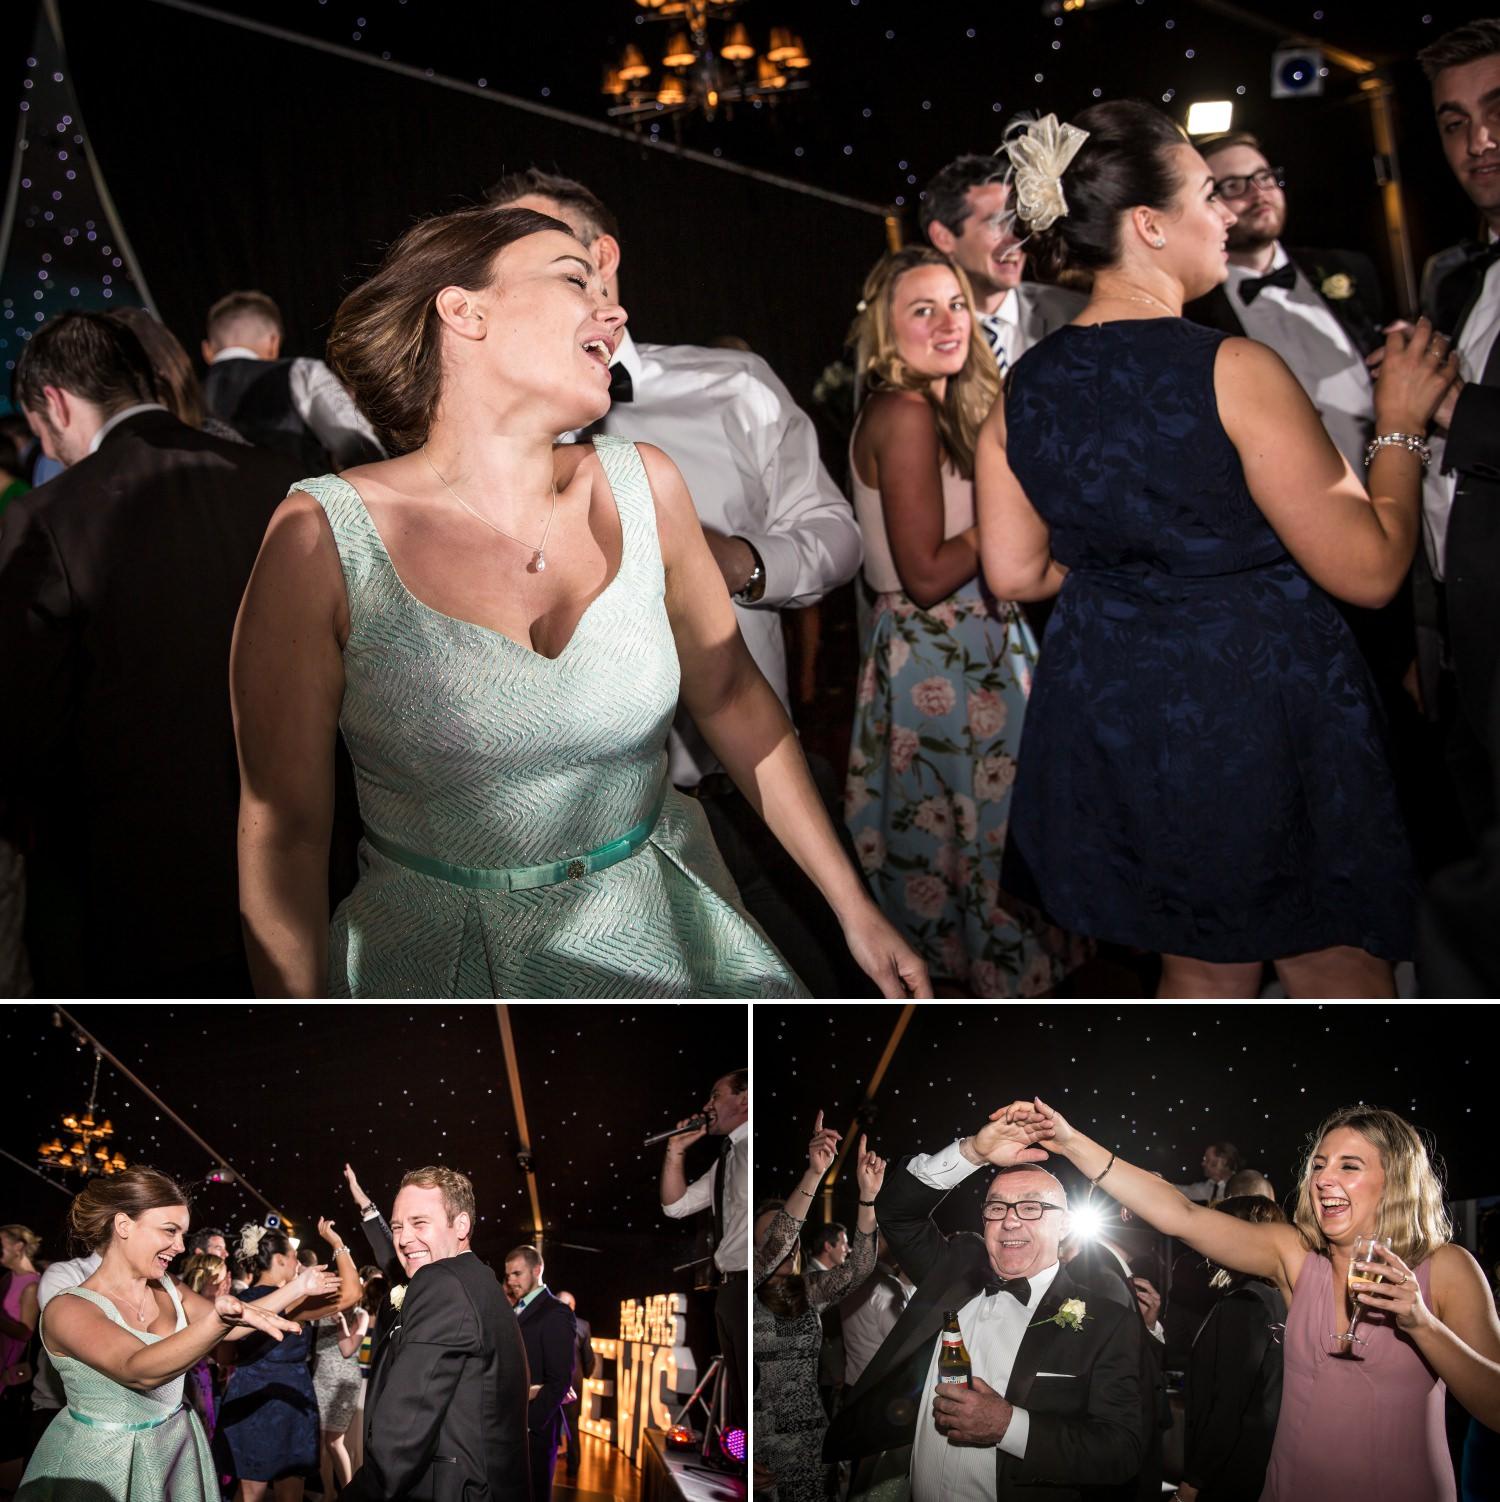 Guests dancing at Hillbark hotel wedding venue